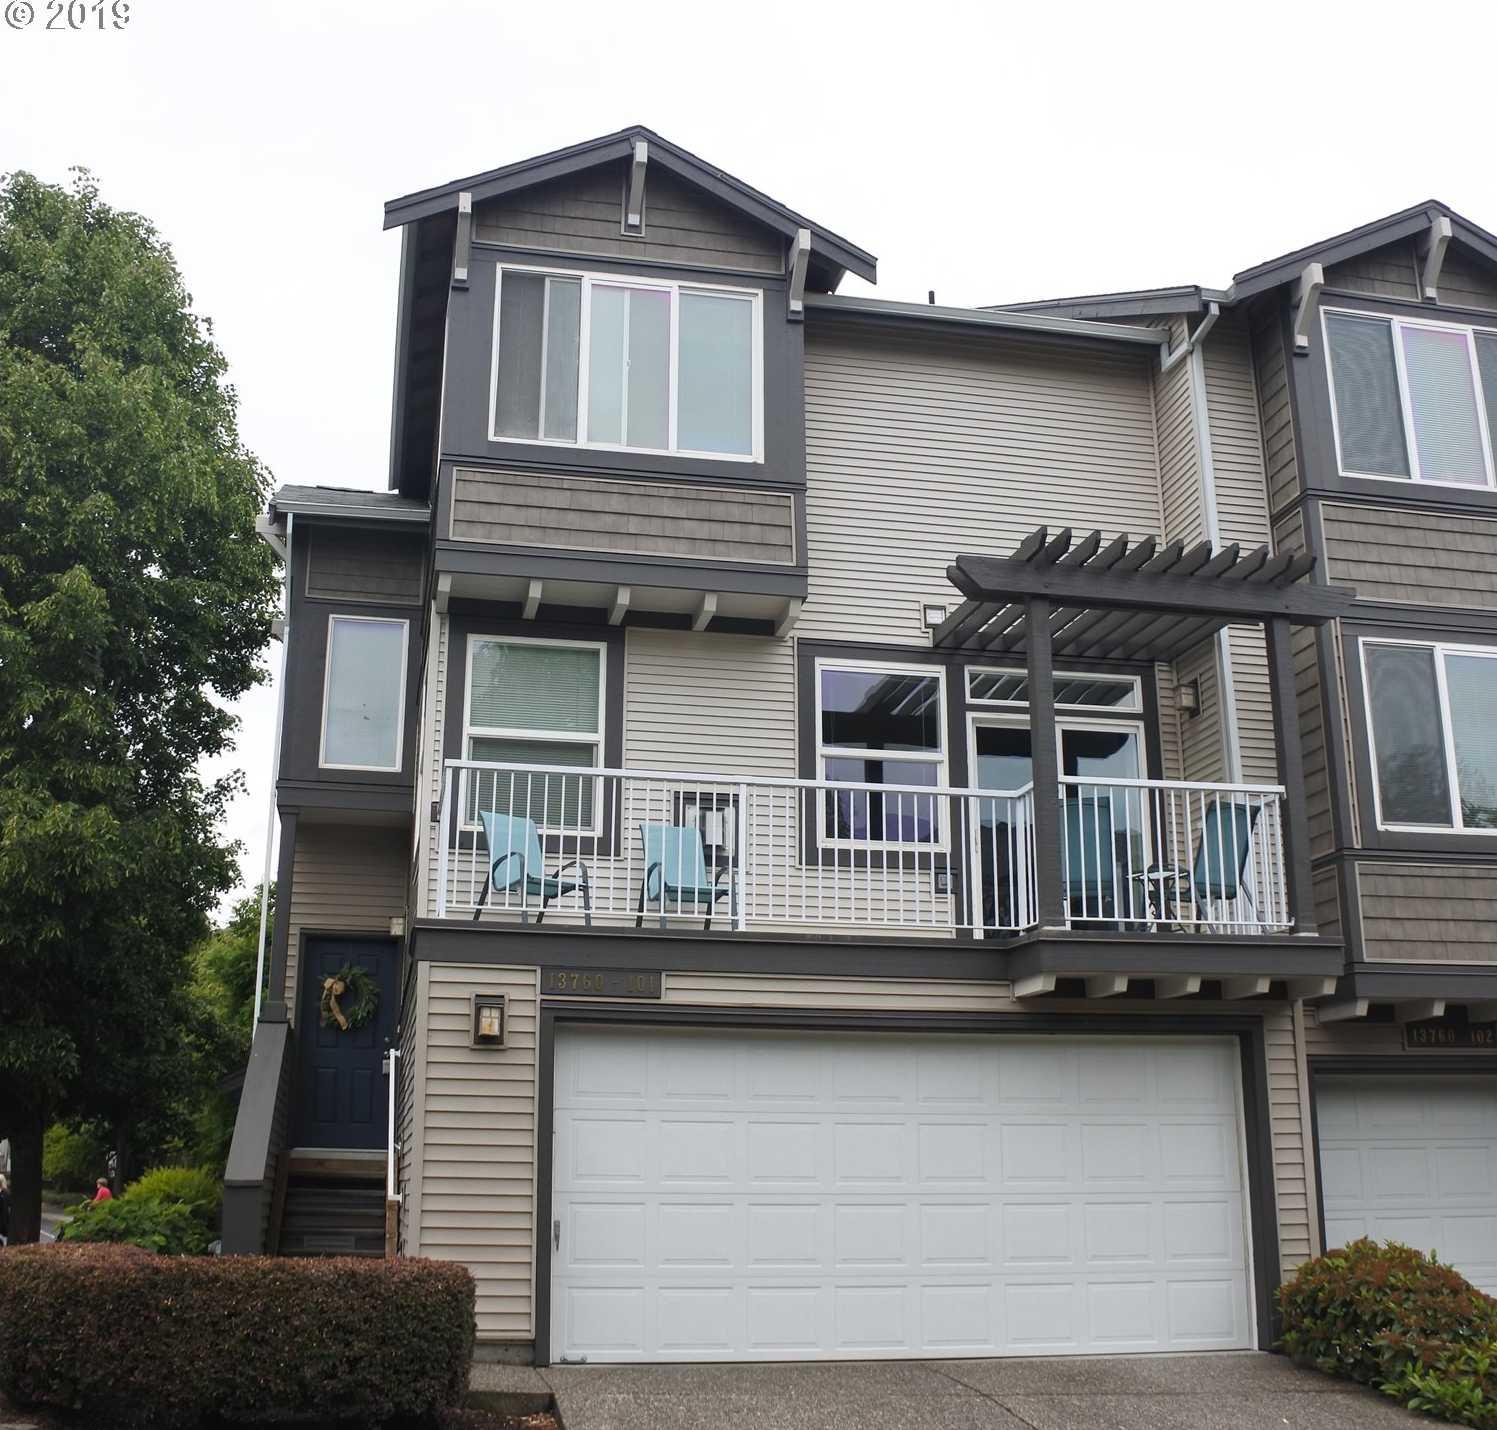 $330,000 - 3Br/3Ba -  for Sale in Beaverton